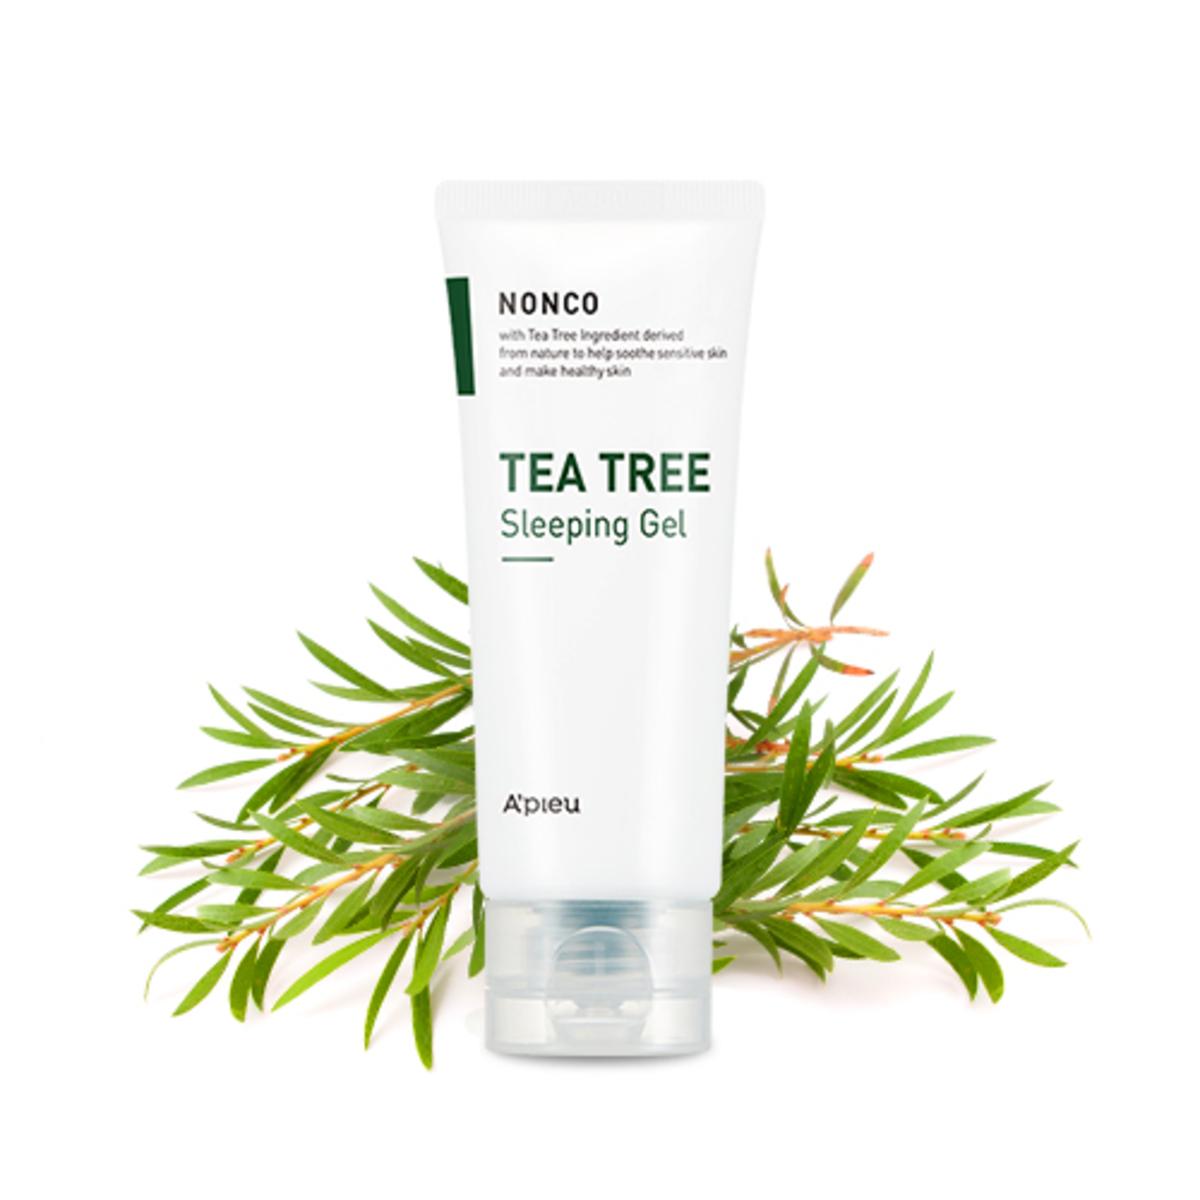 Nanco Tea Tree Sleeping Gel 80ml